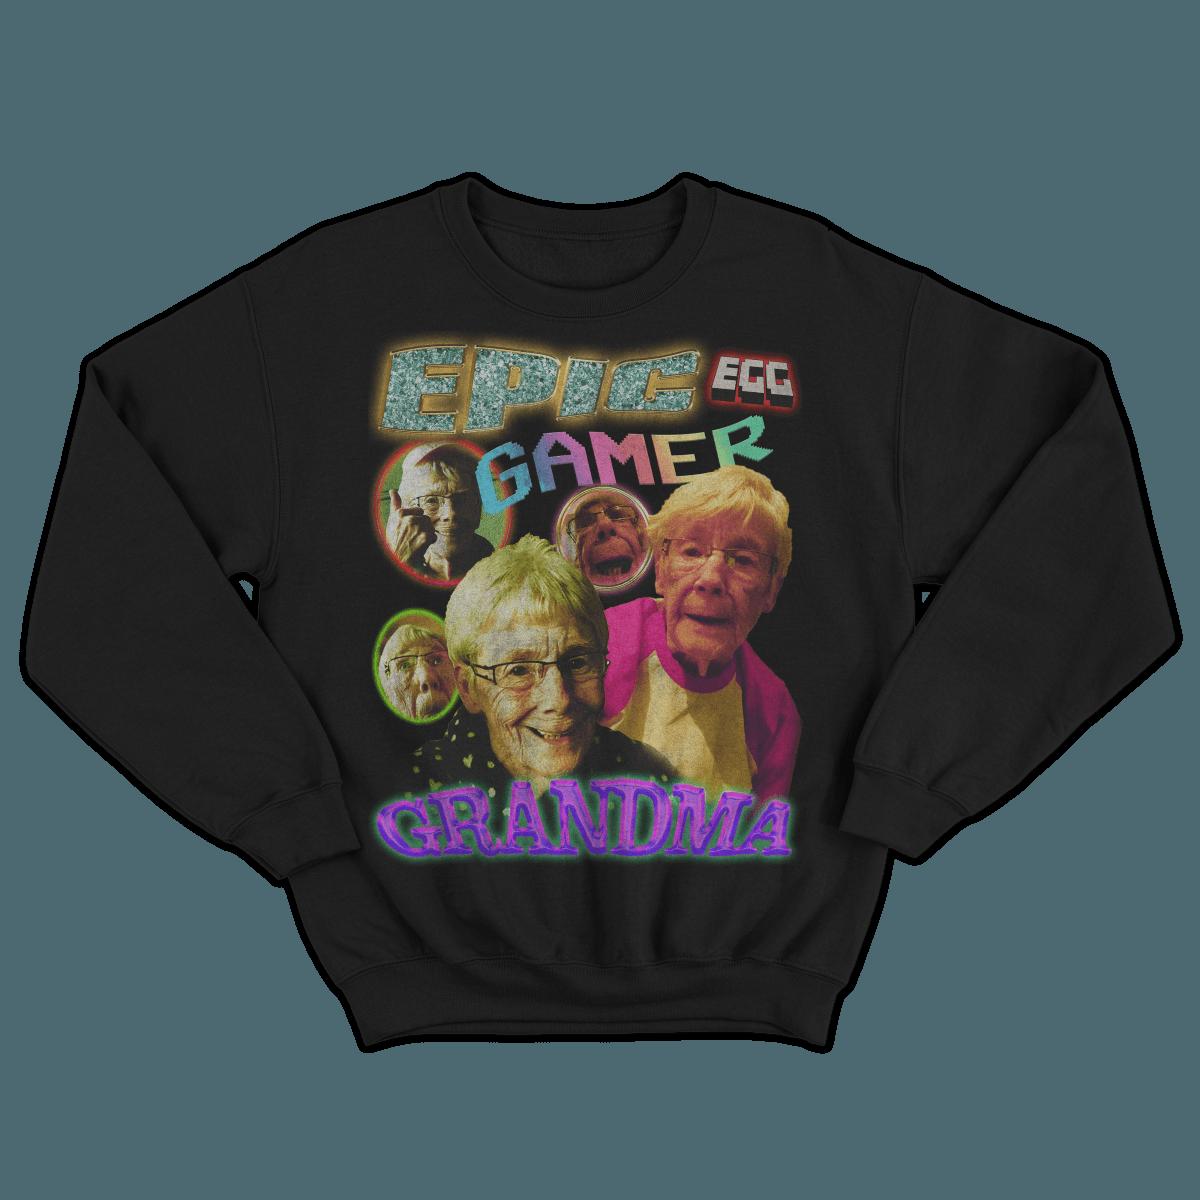 Epic Gamer Grandma - Vintage Bootleg Unisex Sweater